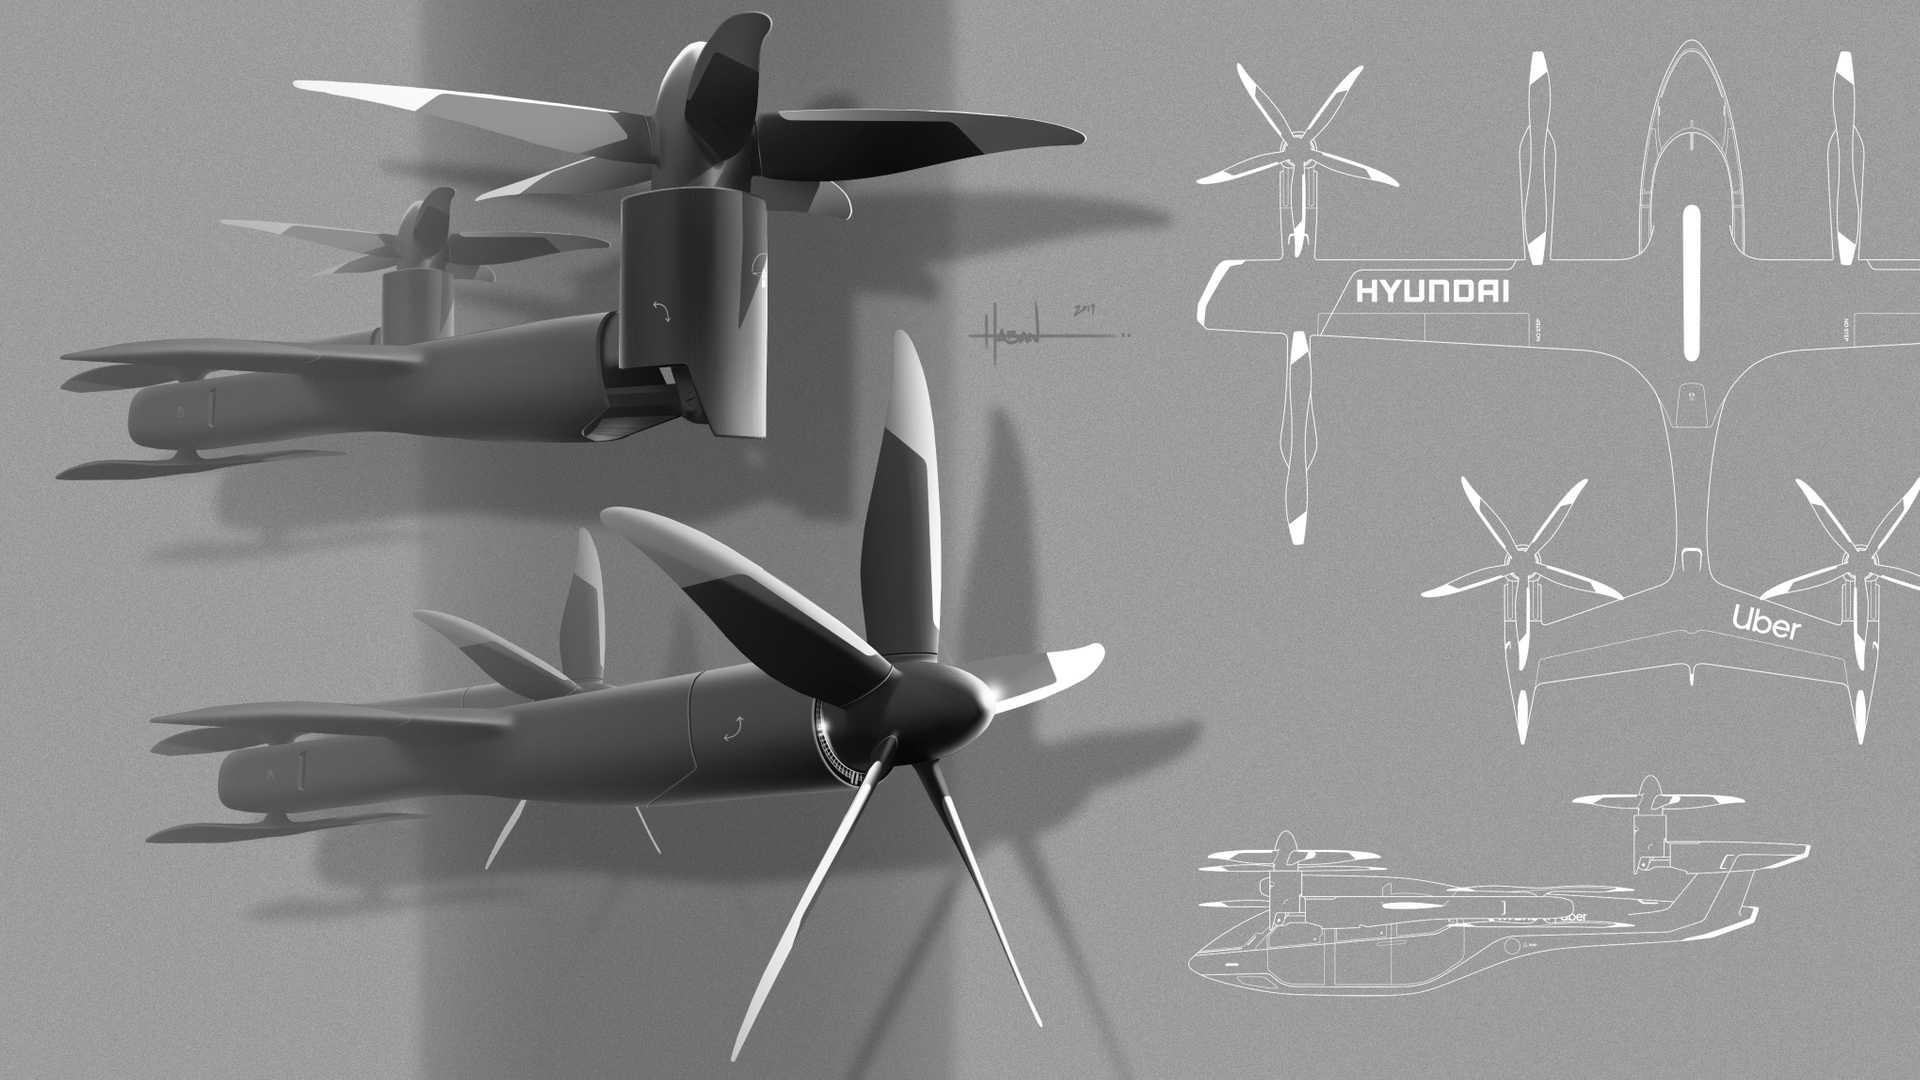 hyundai-uber-ridshare-air-taxi-concept-7